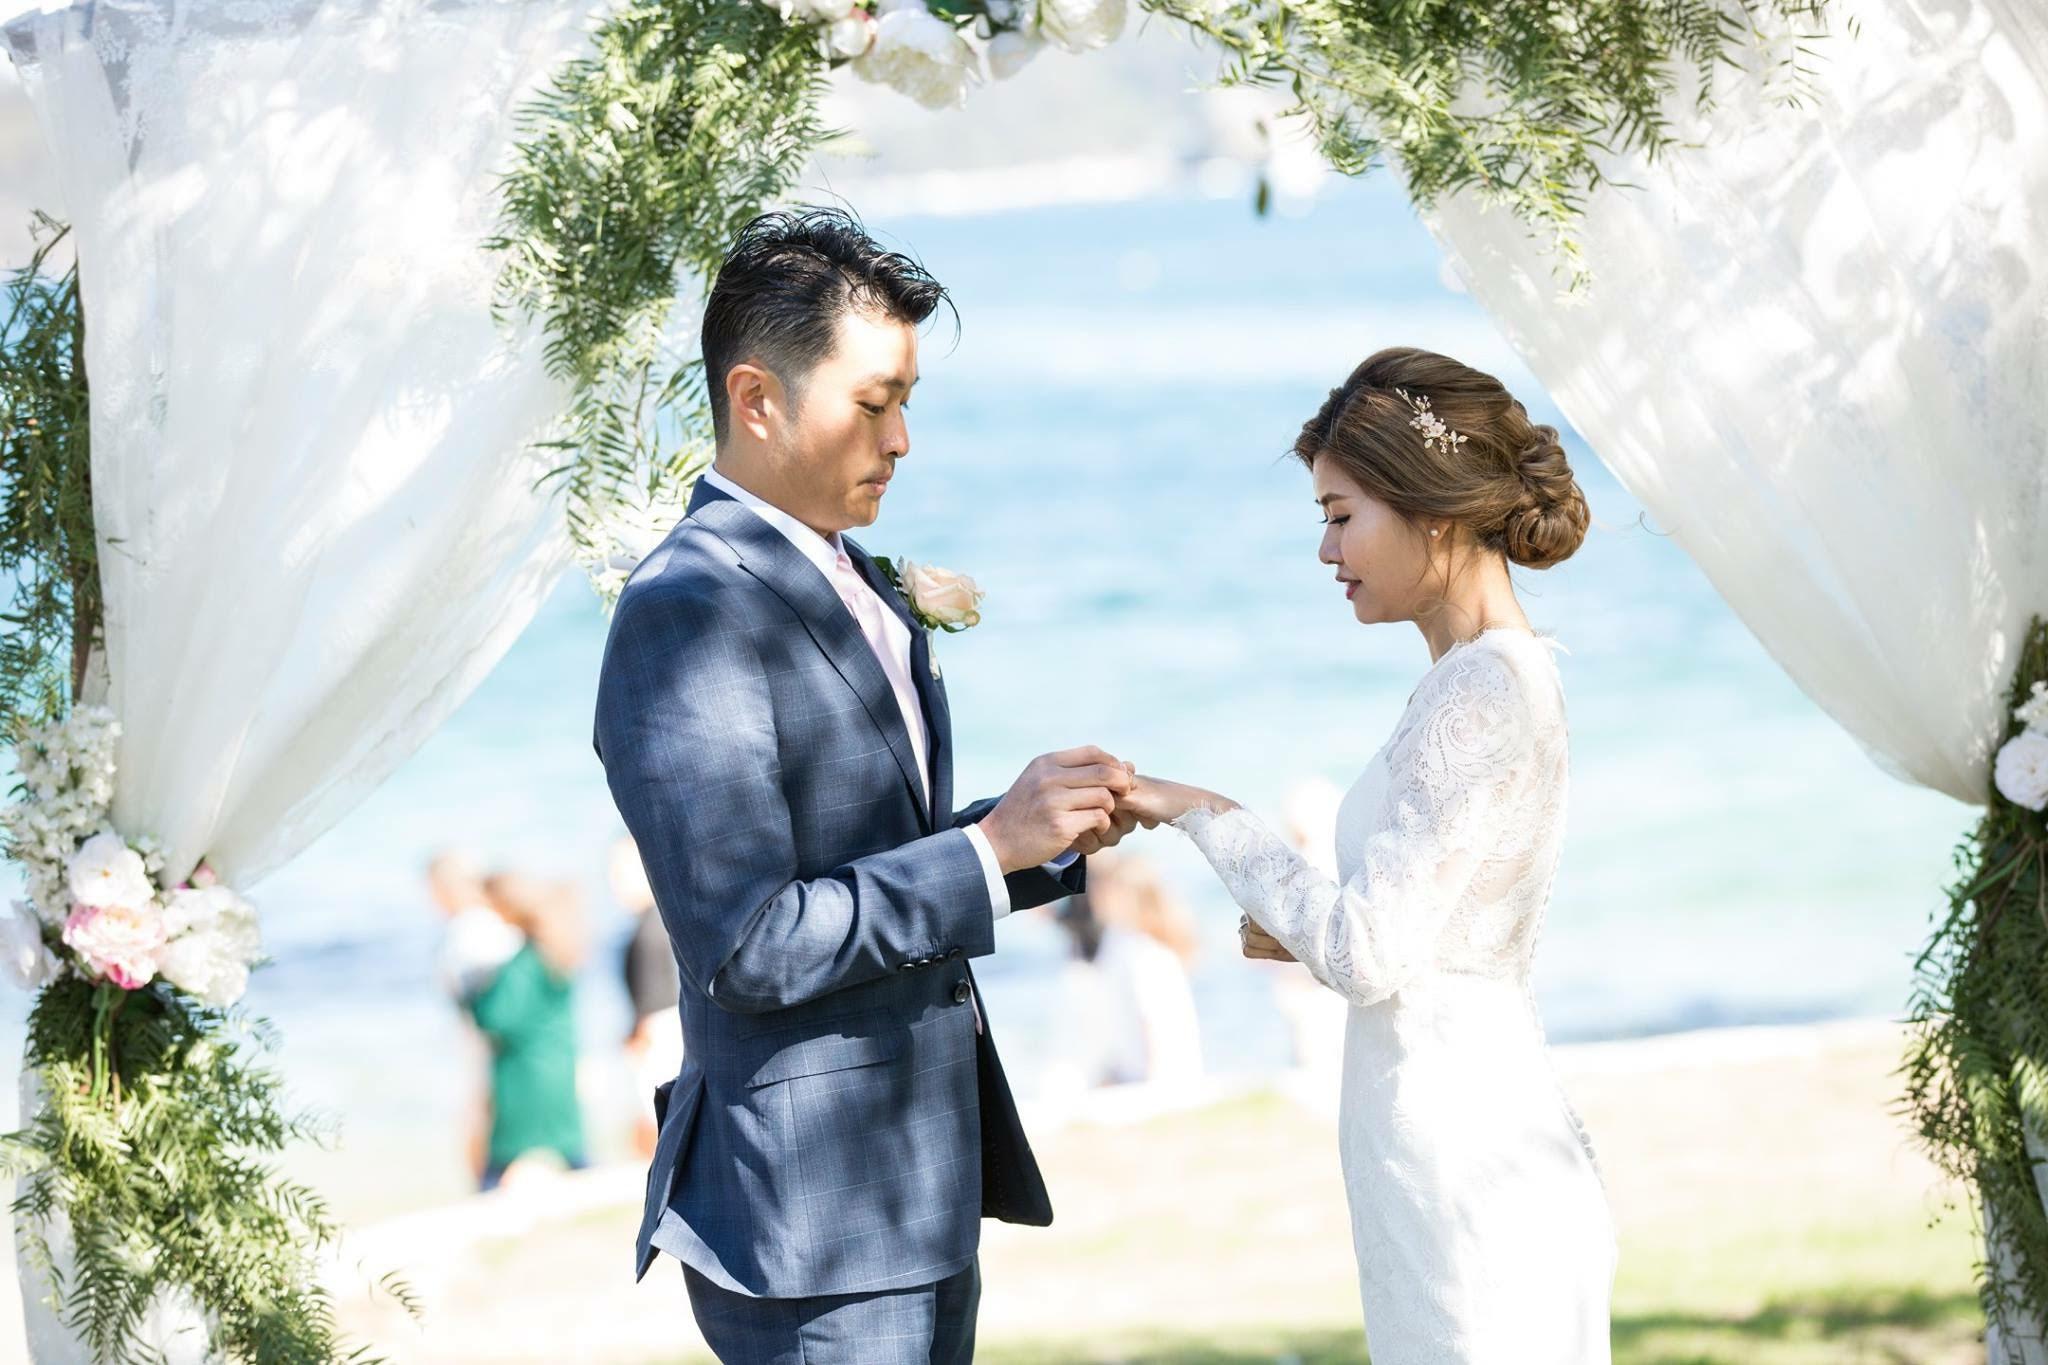 Bride and groom at Watsons Bay Wedding - Sydney Wedding Planner Samantha Burke Events